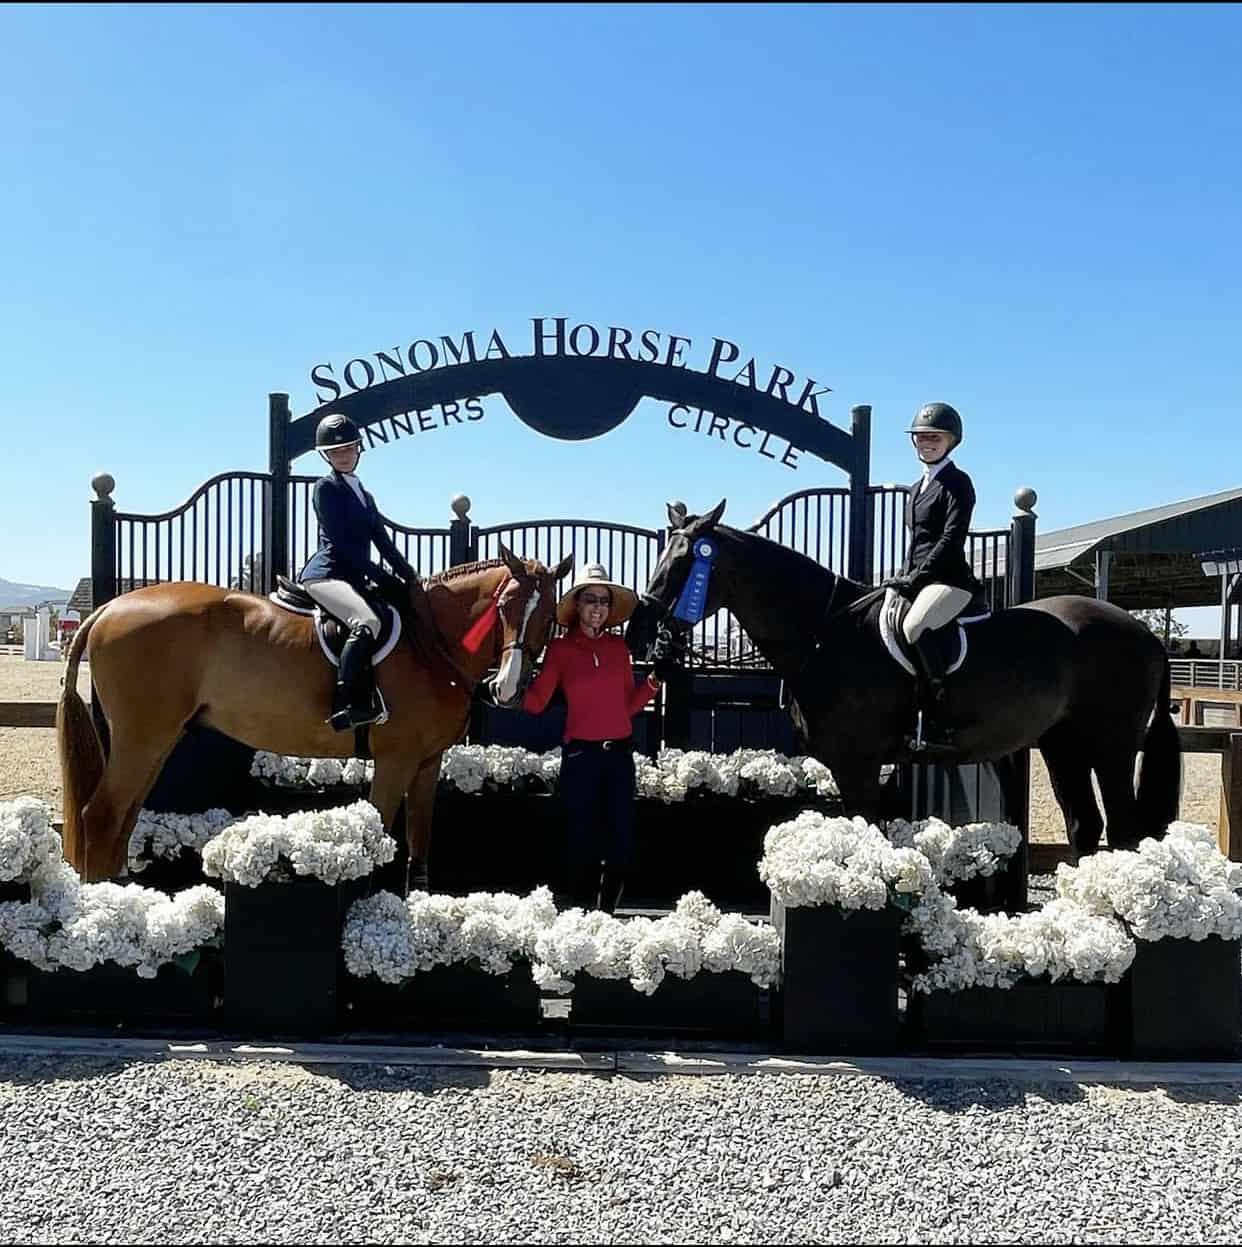 Blueridge Farm Riders in the Winner's Circle at Sonoma Horsepark